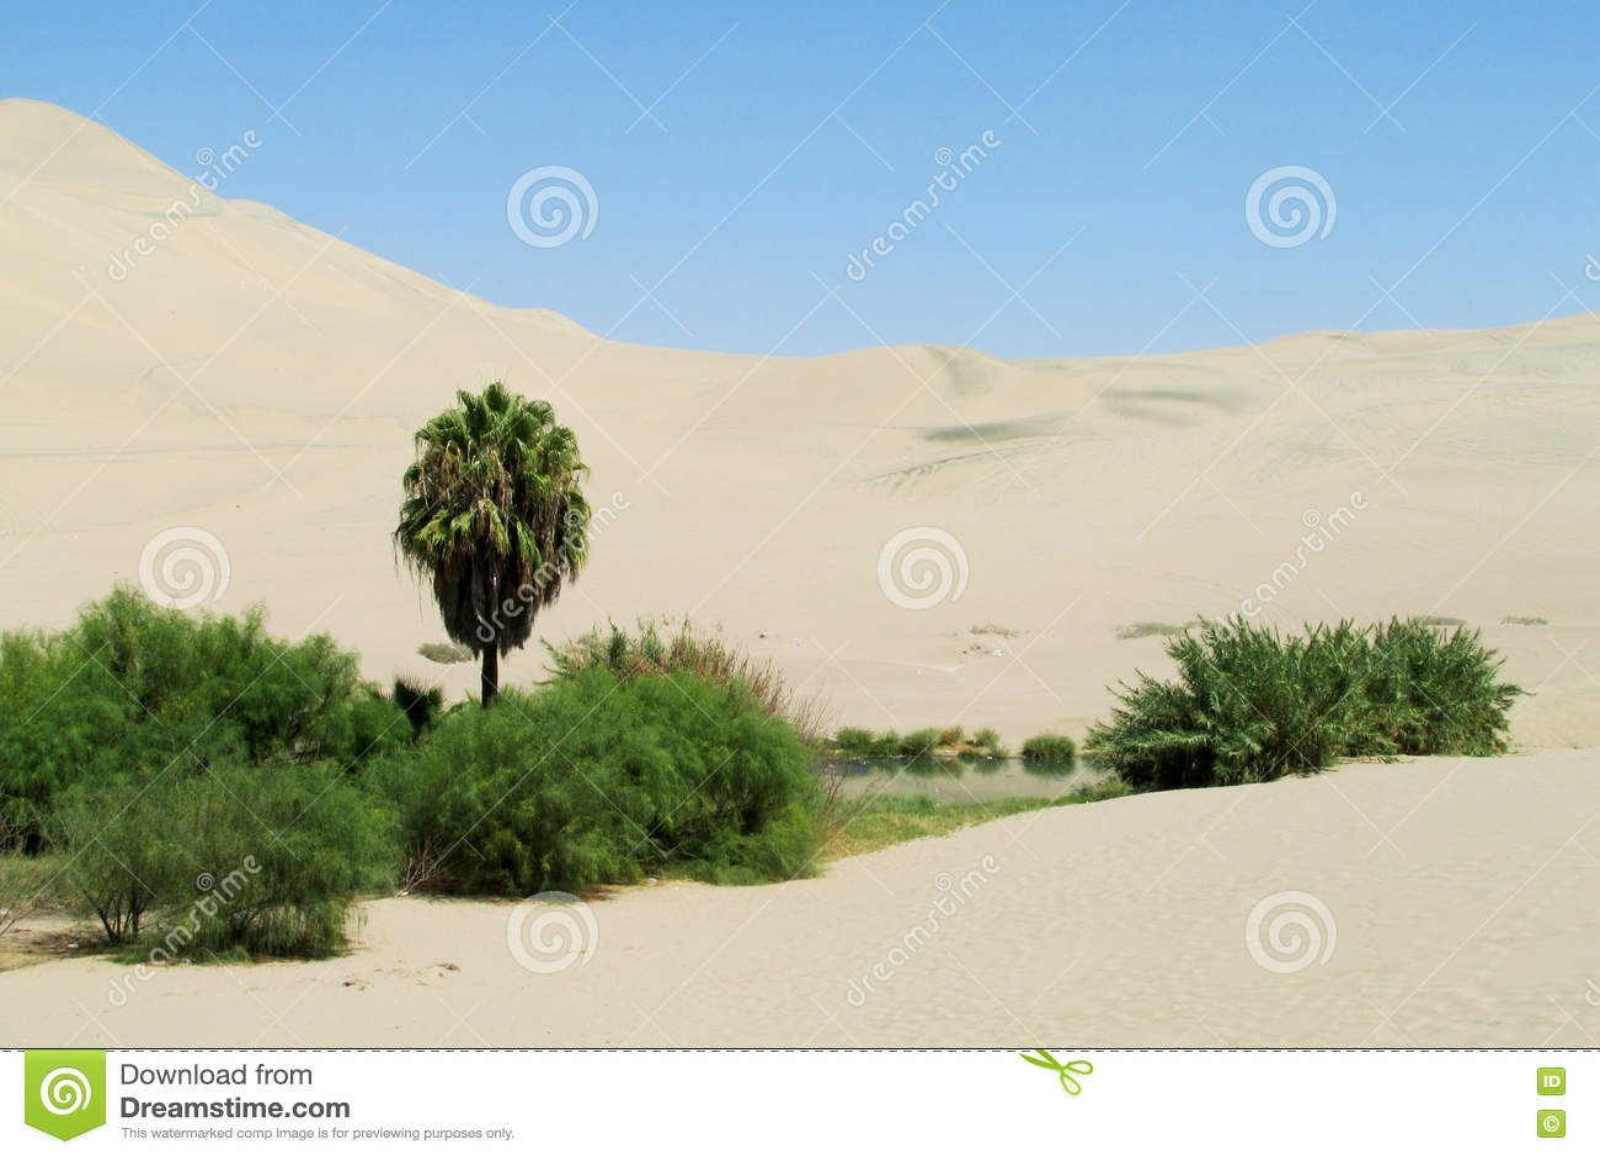 Sand desert dunes and green oasis